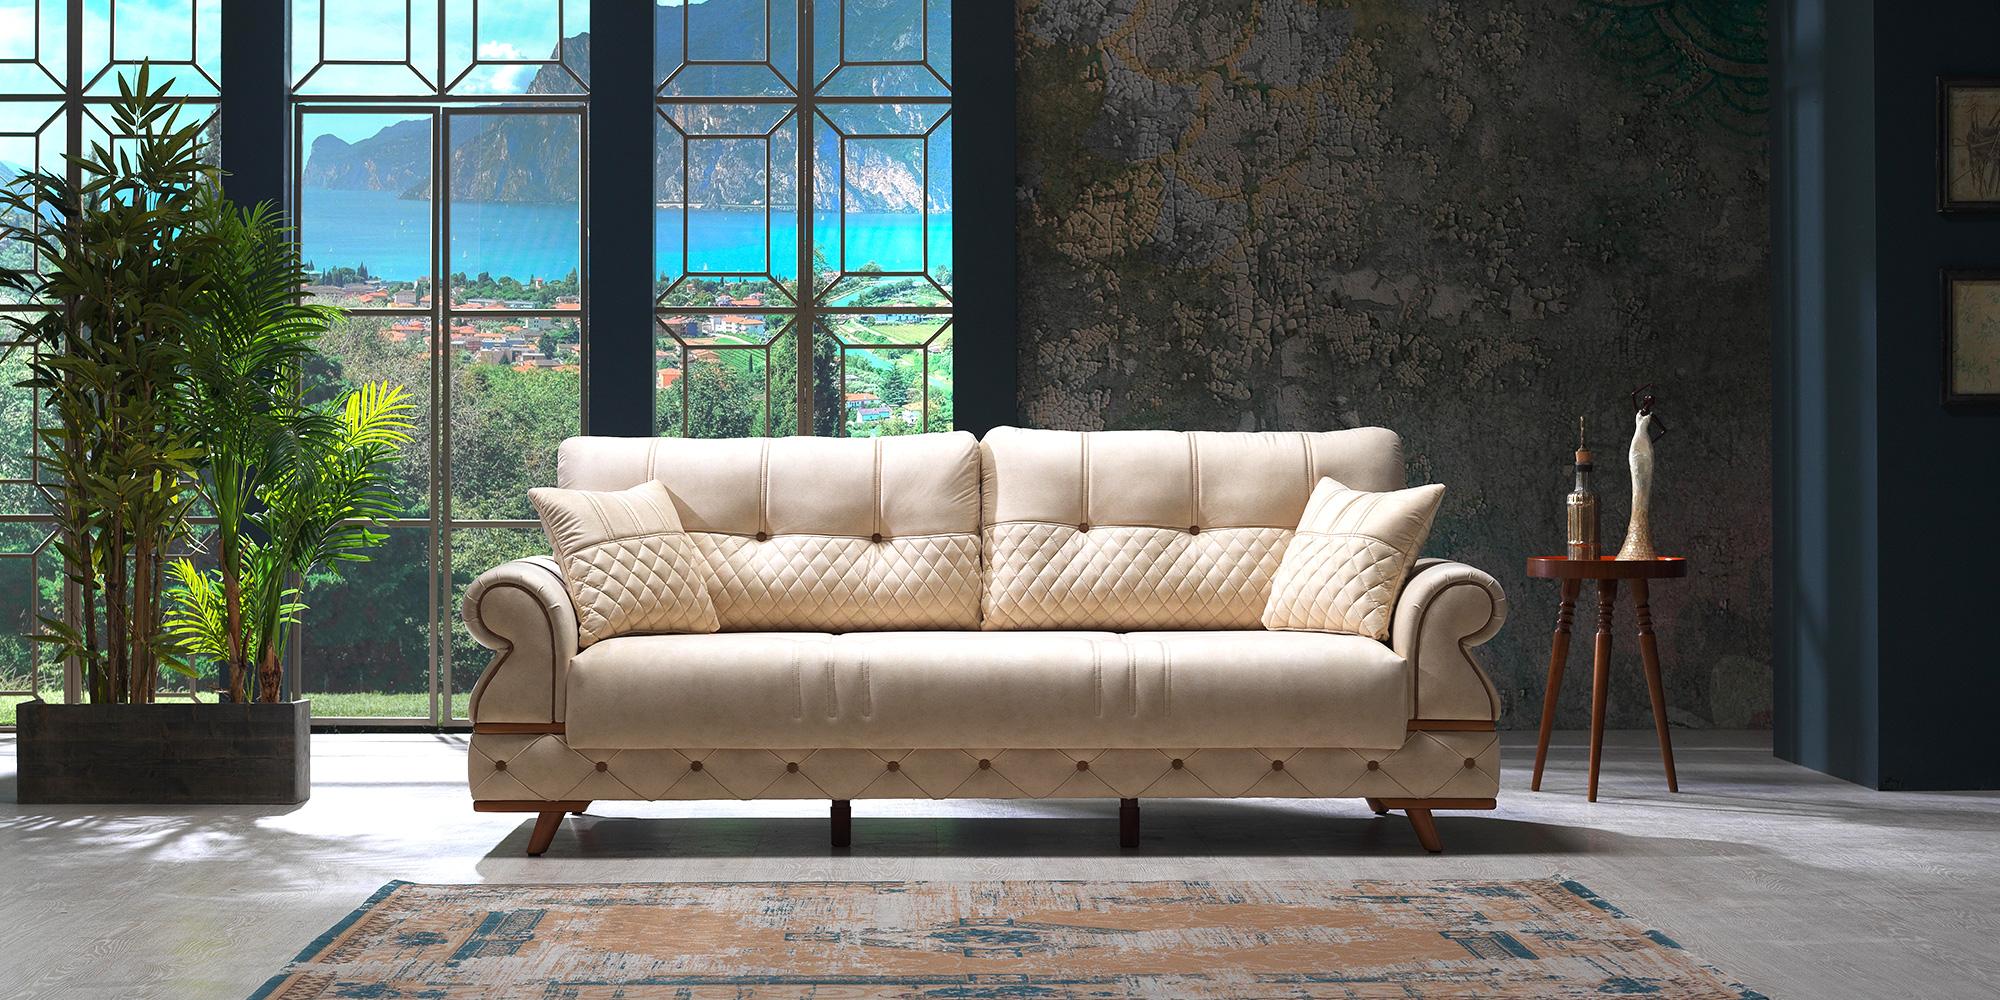 pavena 3 2 1 delux sofa set yuvam m belhaus in wuppertal cilek offizieller h ndler in europa. Black Bedroom Furniture Sets. Home Design Ideas